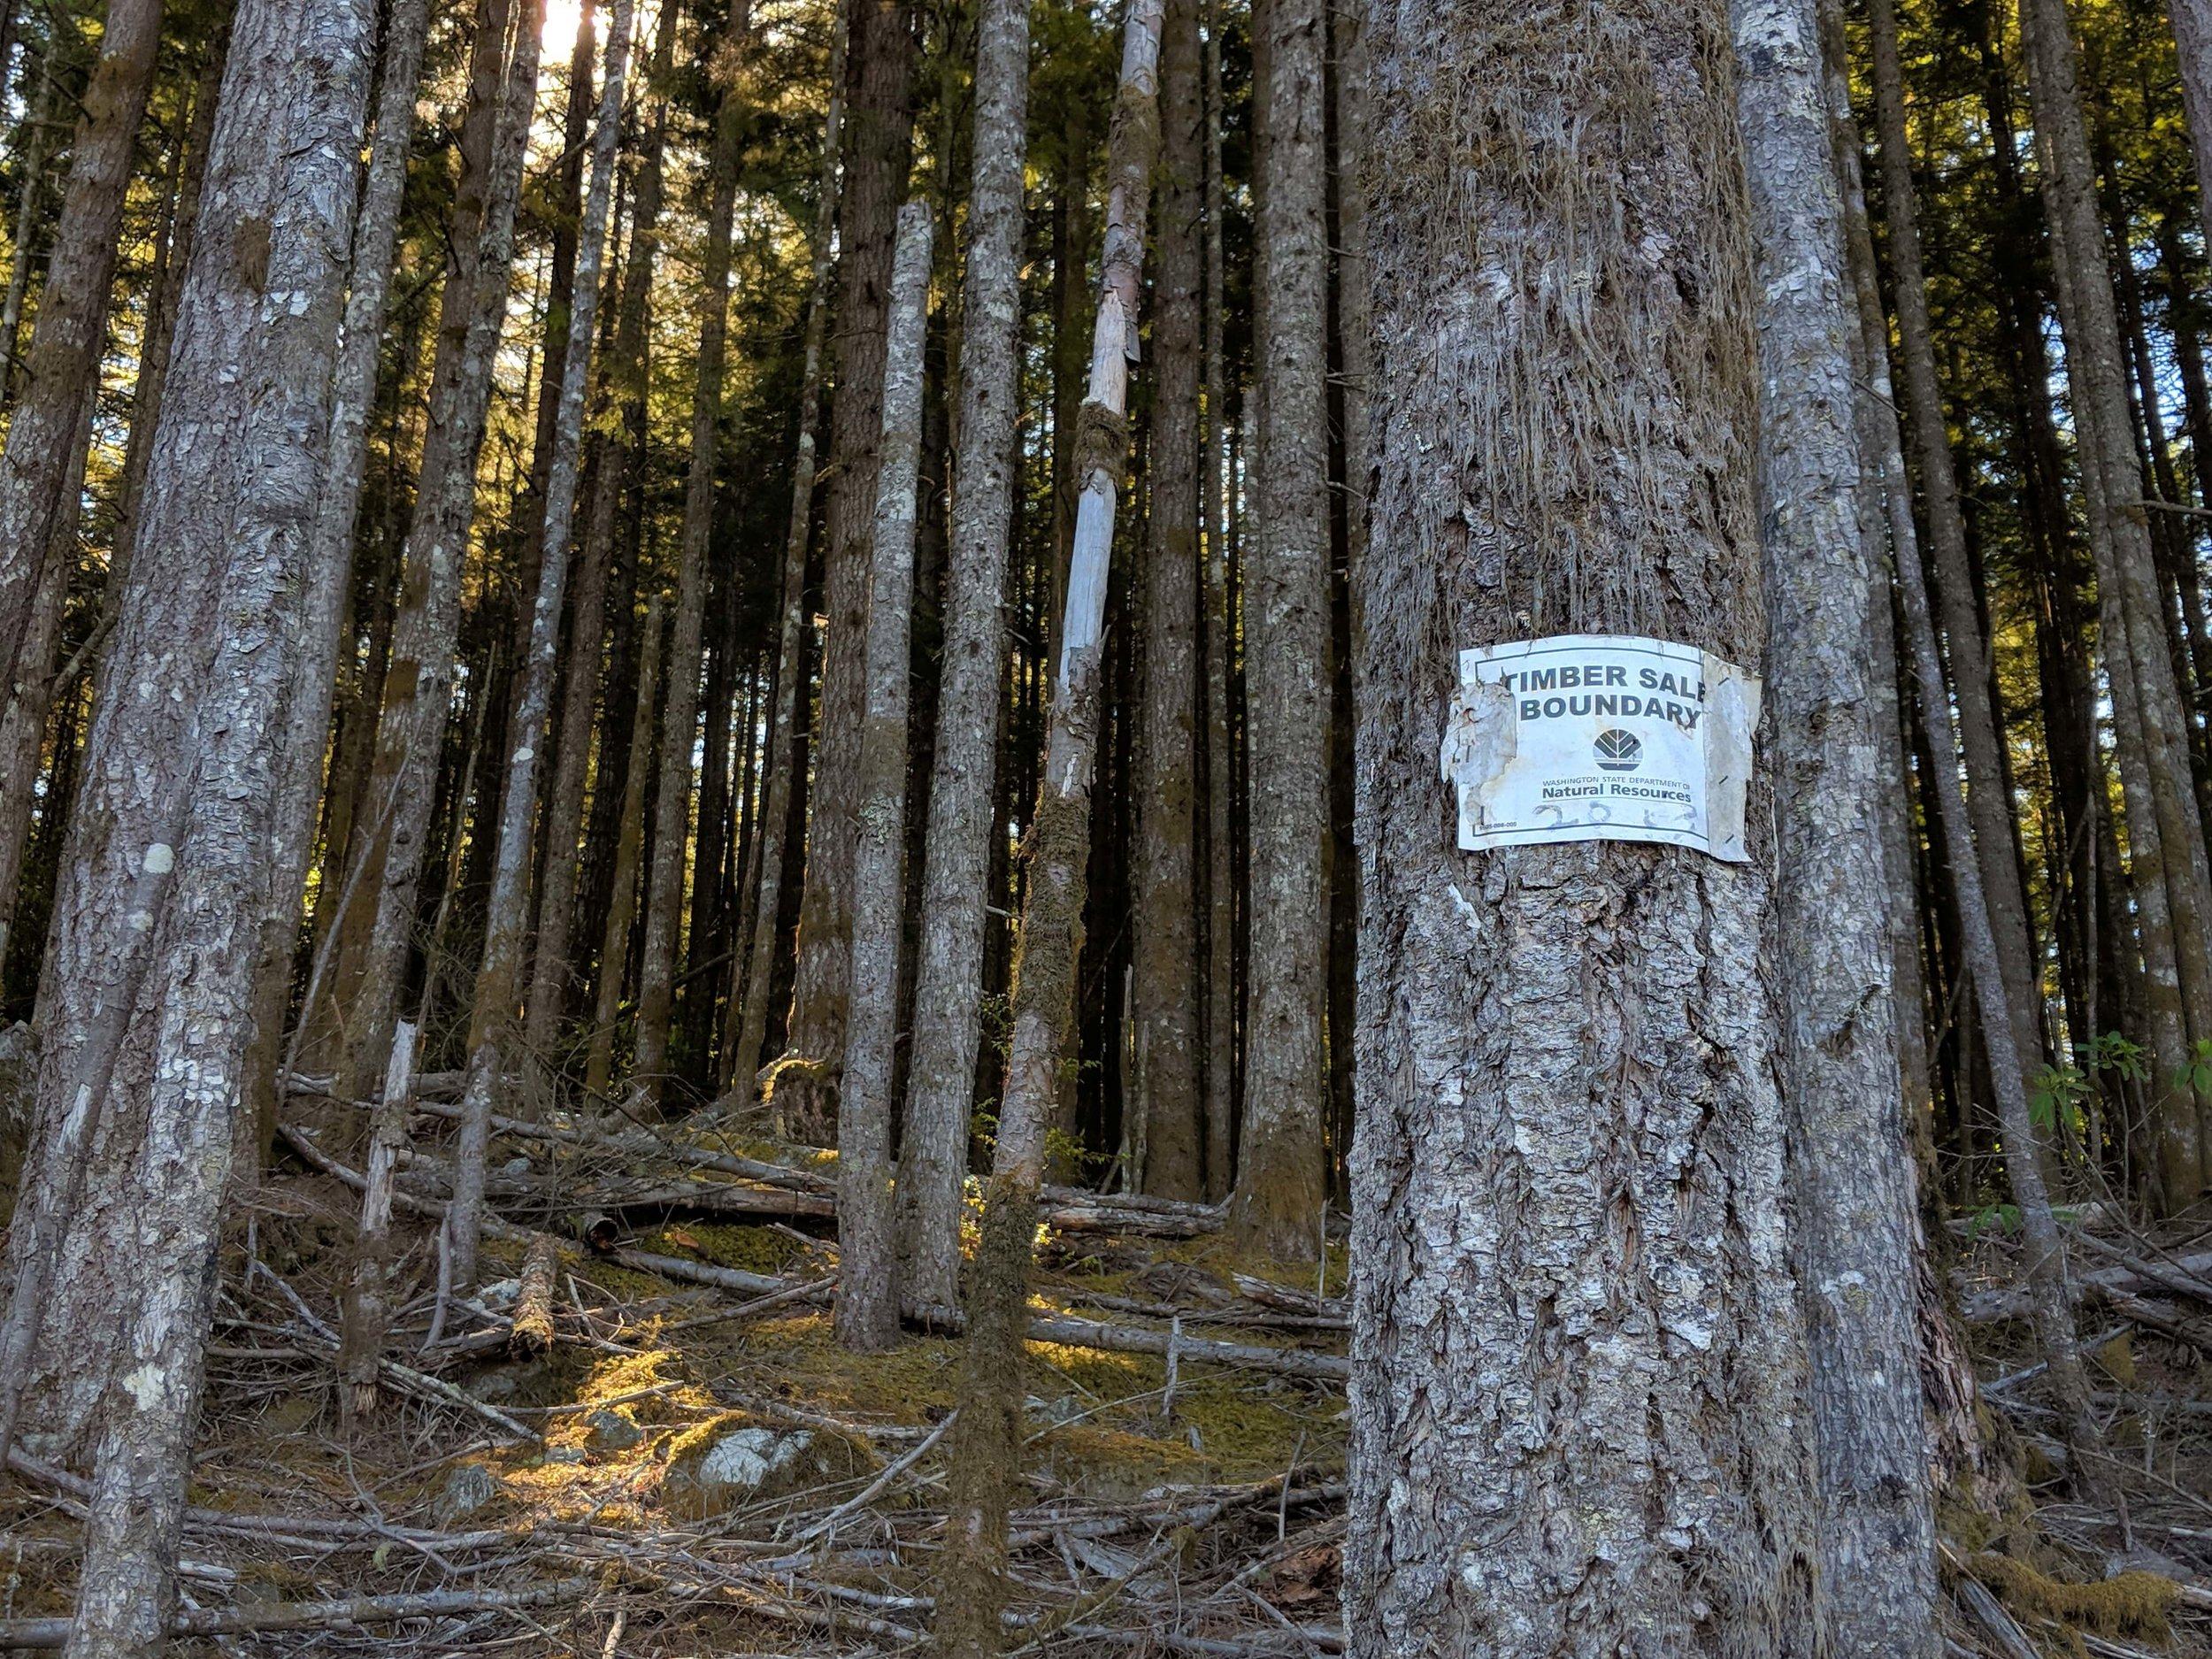 Timber sale boundary line